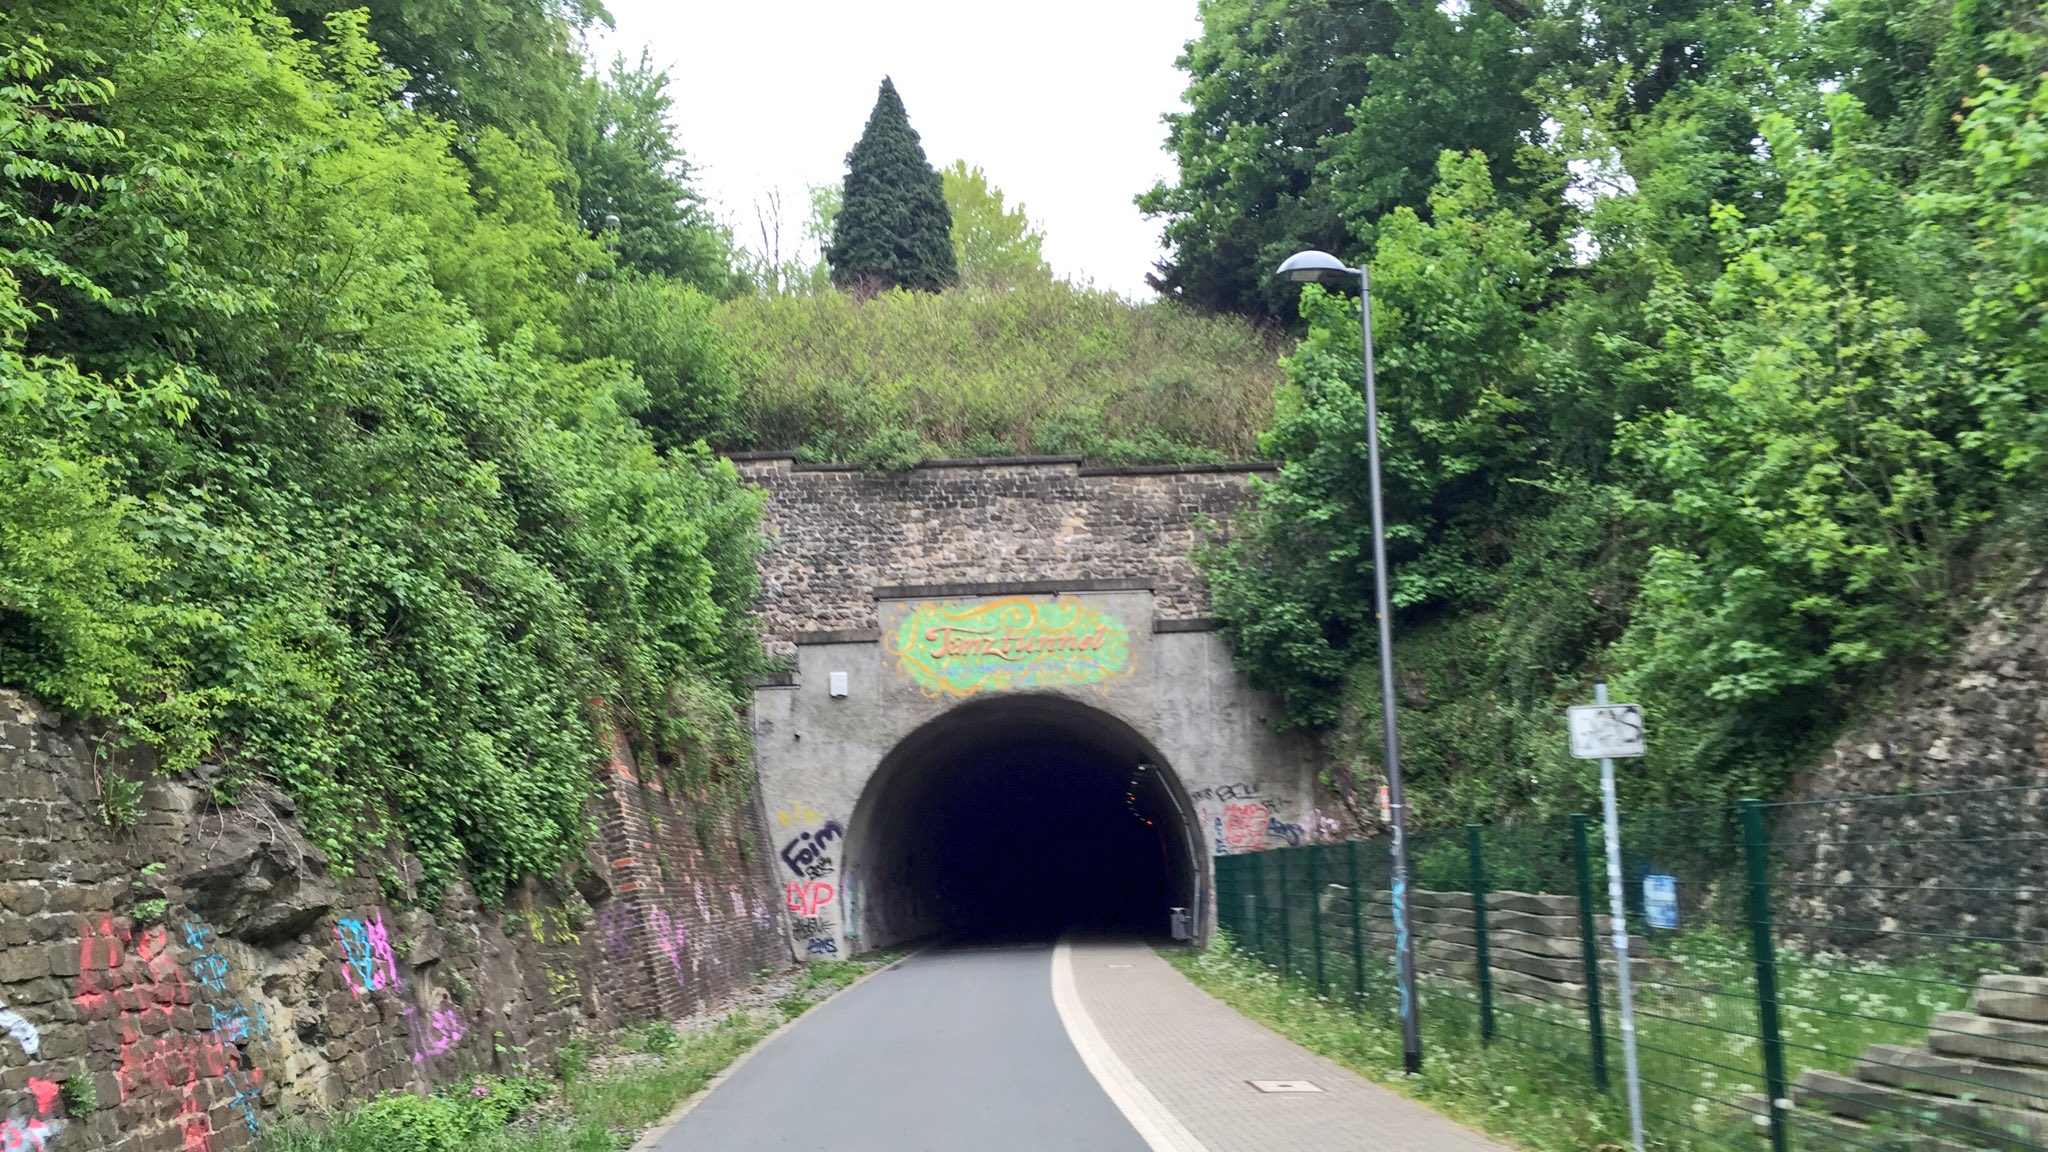 Love that shit. Trassen Tour durchs Bergische ins Ruhrtal. 162,5km in 06:15h. #comebackstrongerthanever https://t.co/YKdrWW93m0